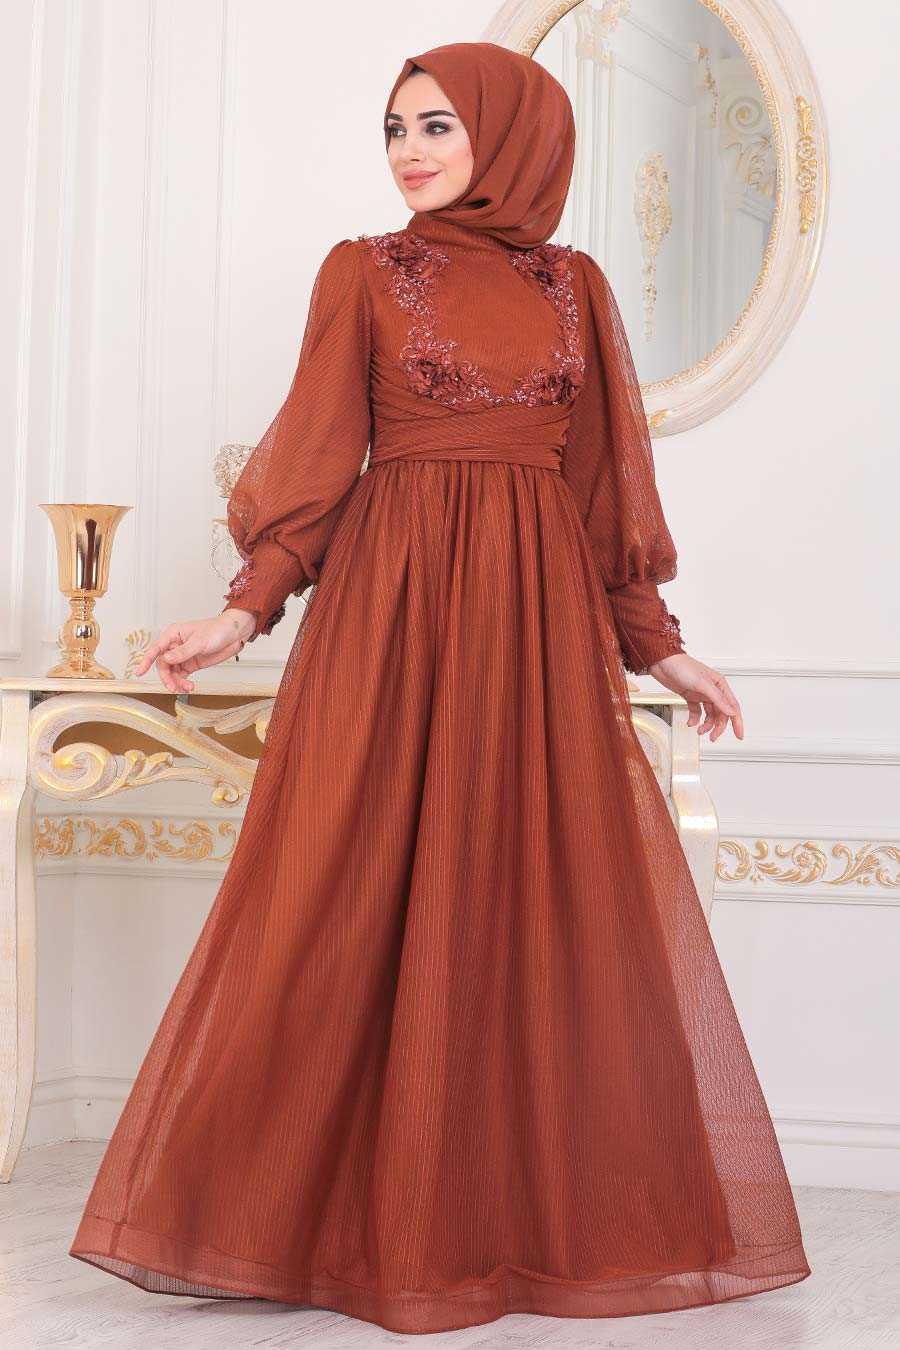 Terra Cotta Hijab Evening Dress 40302KRMT